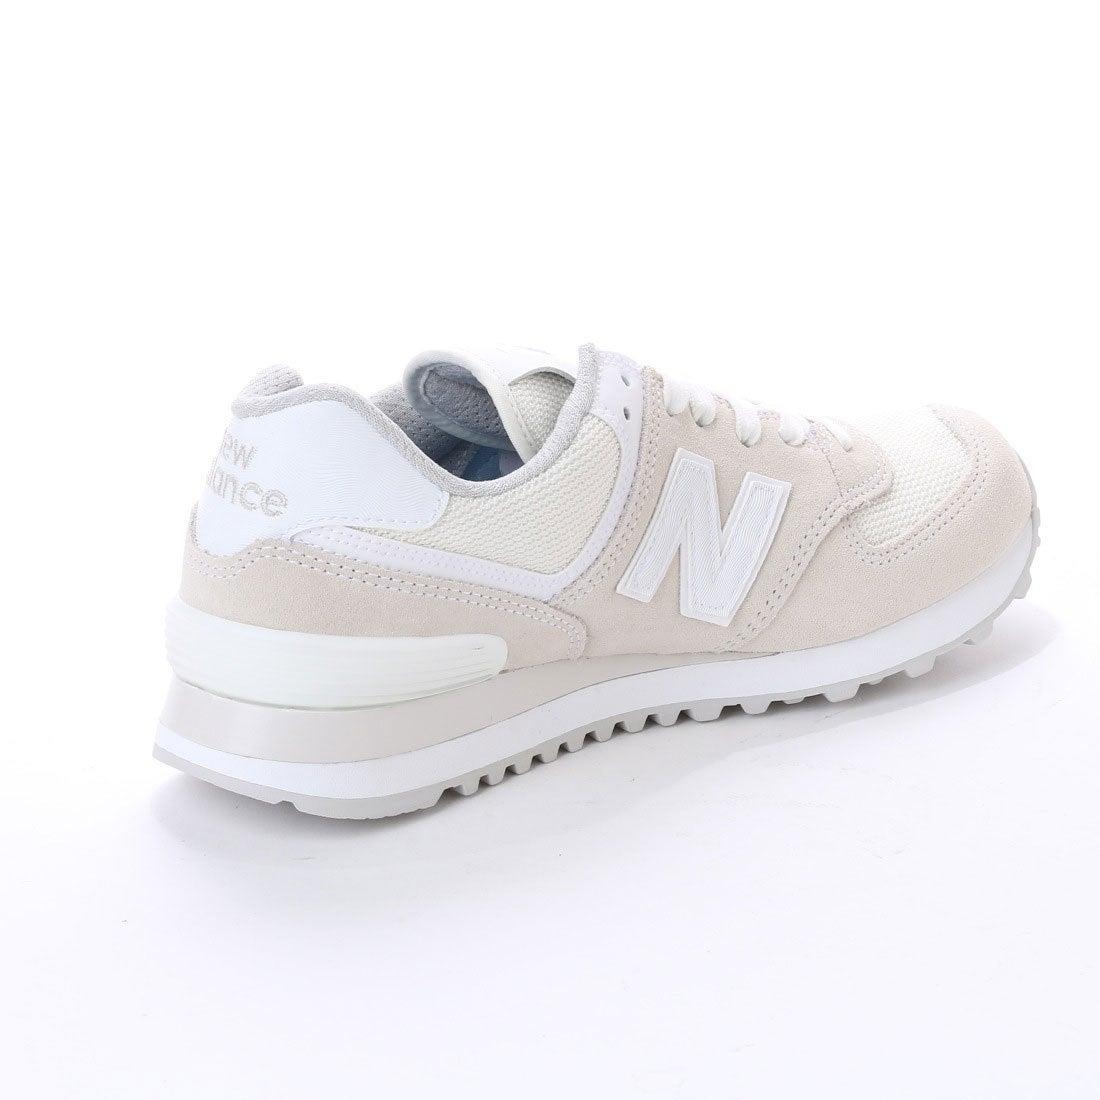 d46c9b76d6401 ニューバランス new balance NB ML574 SEF (シーソルト) -靴 ...